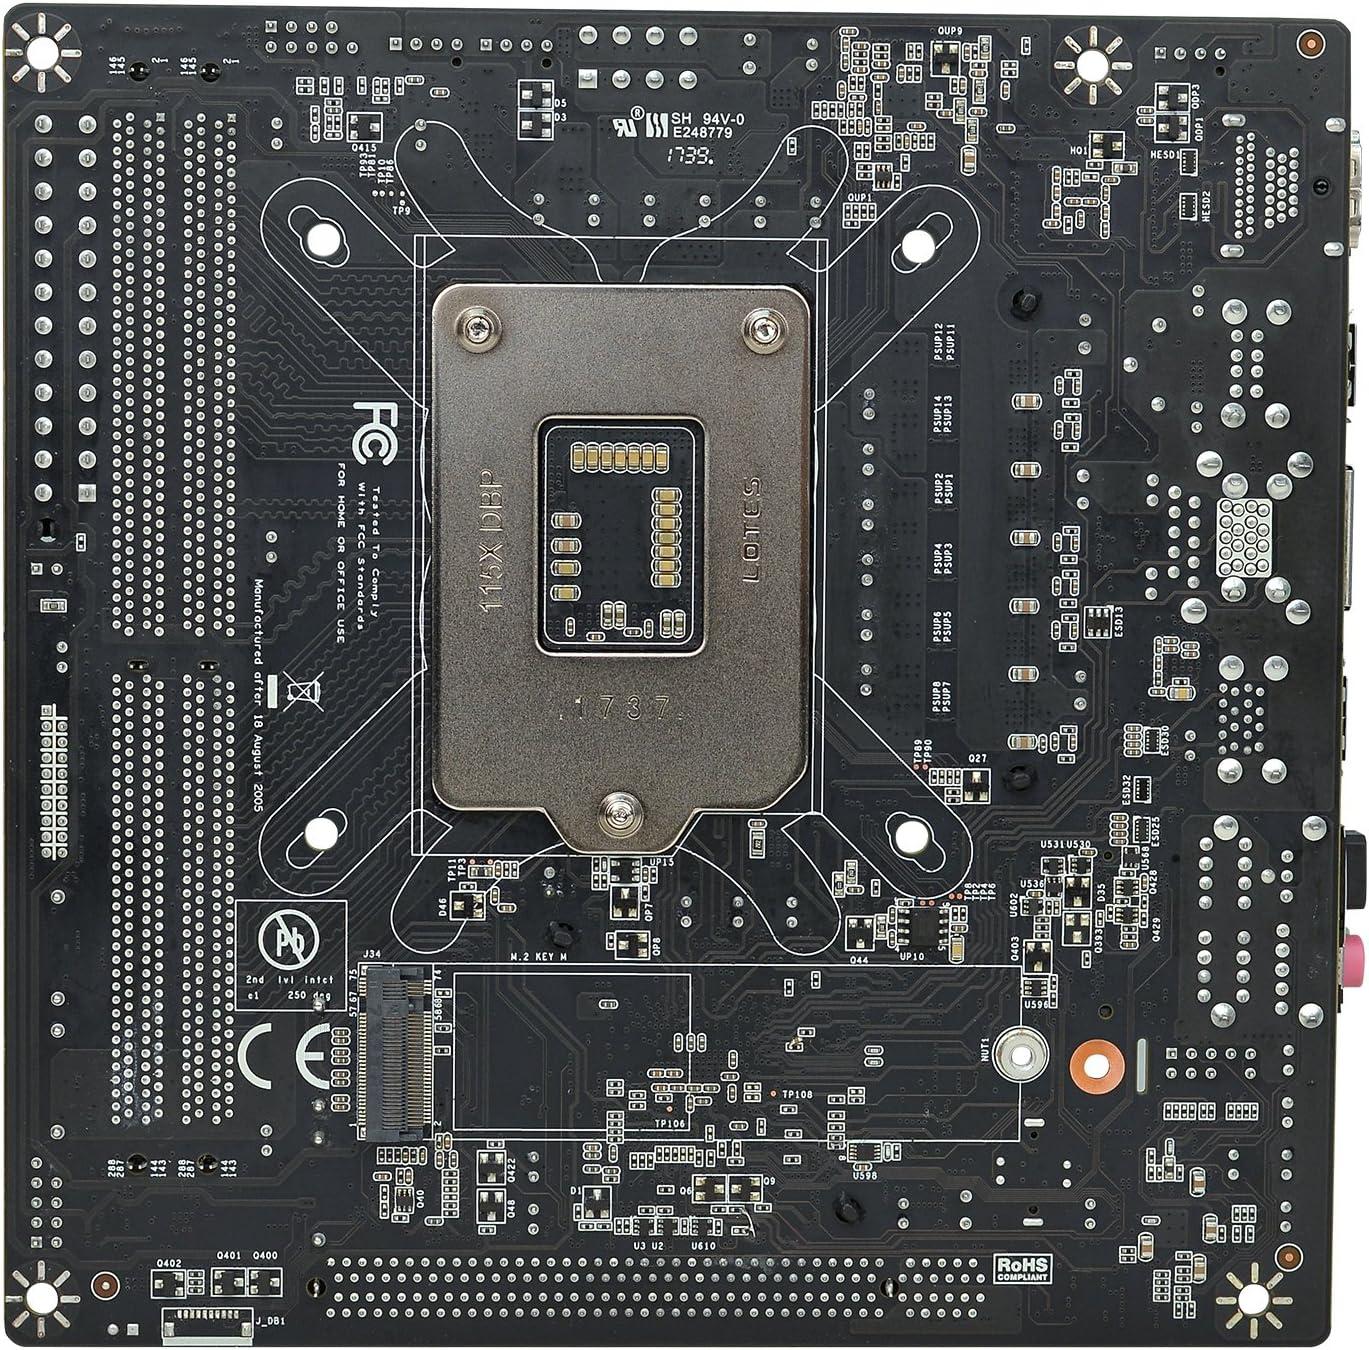 Intel Motherboard 111-CS-E371-KR Intel H370 LGA 1151 mITX SATA 6Gb//s EVGA H370 Stinger USB 3.1